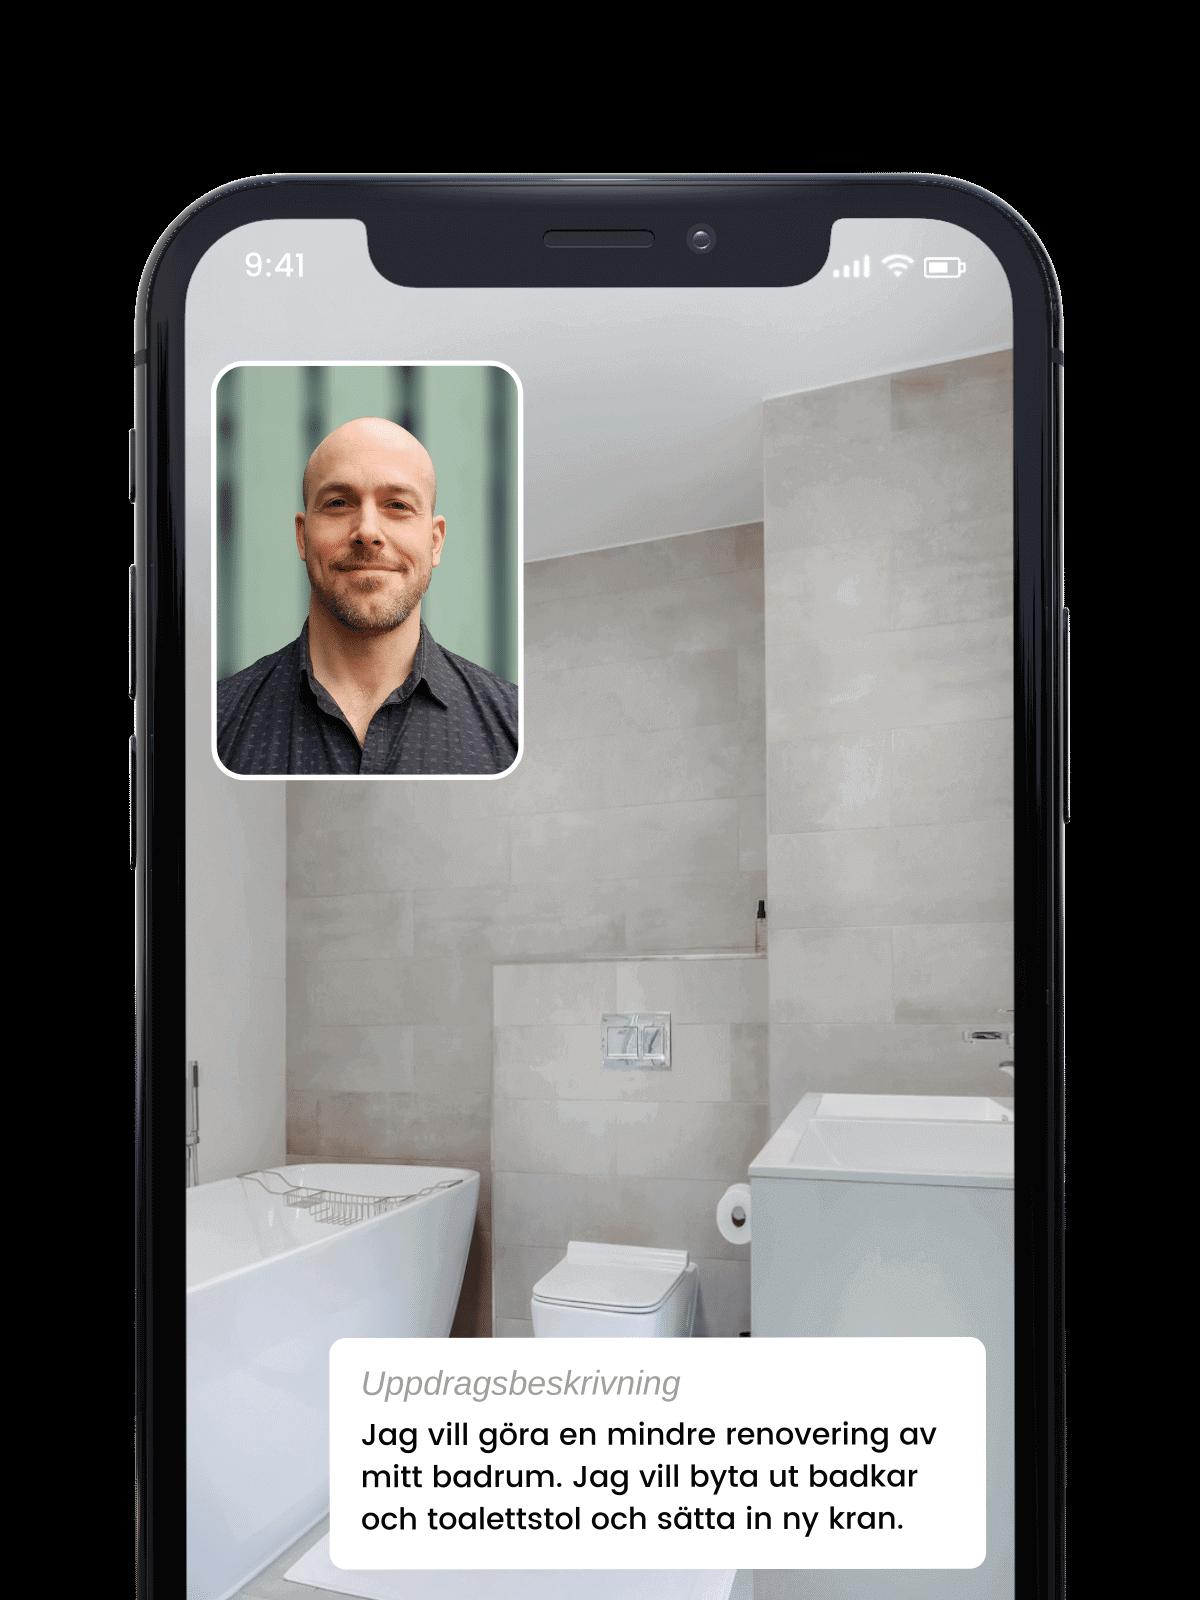 Videosamtal i Done-appen med rörmokare